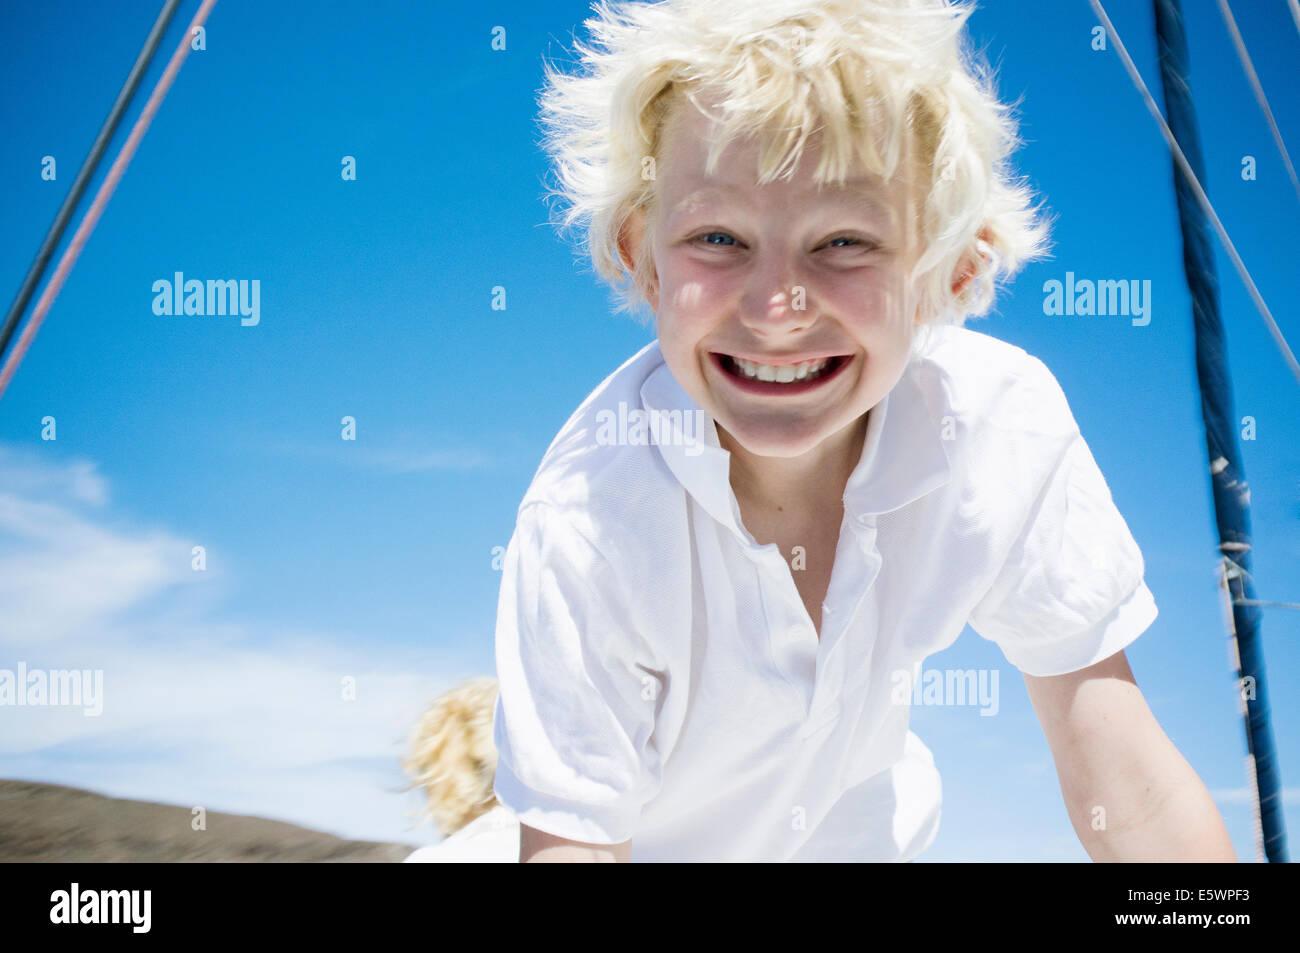 Portrait of enthusiastic boy on catamaran near Fuerteventura, Spain - Stock Image